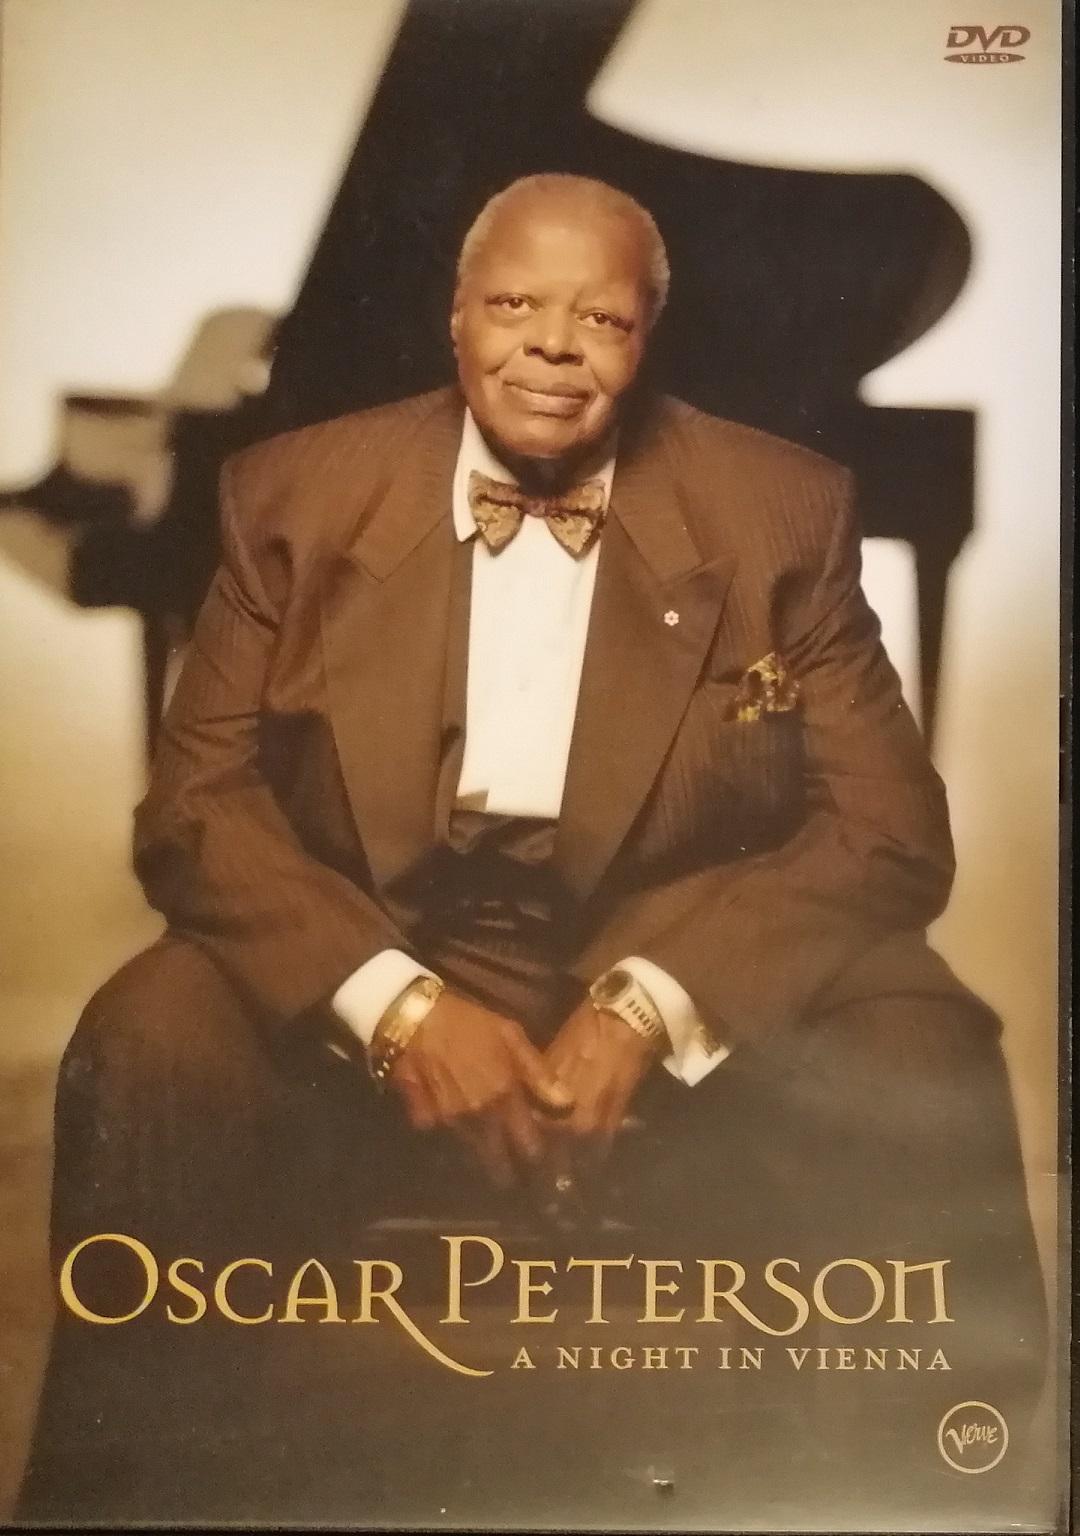 Oscar Peterson - A night in Vienna - DVD plast